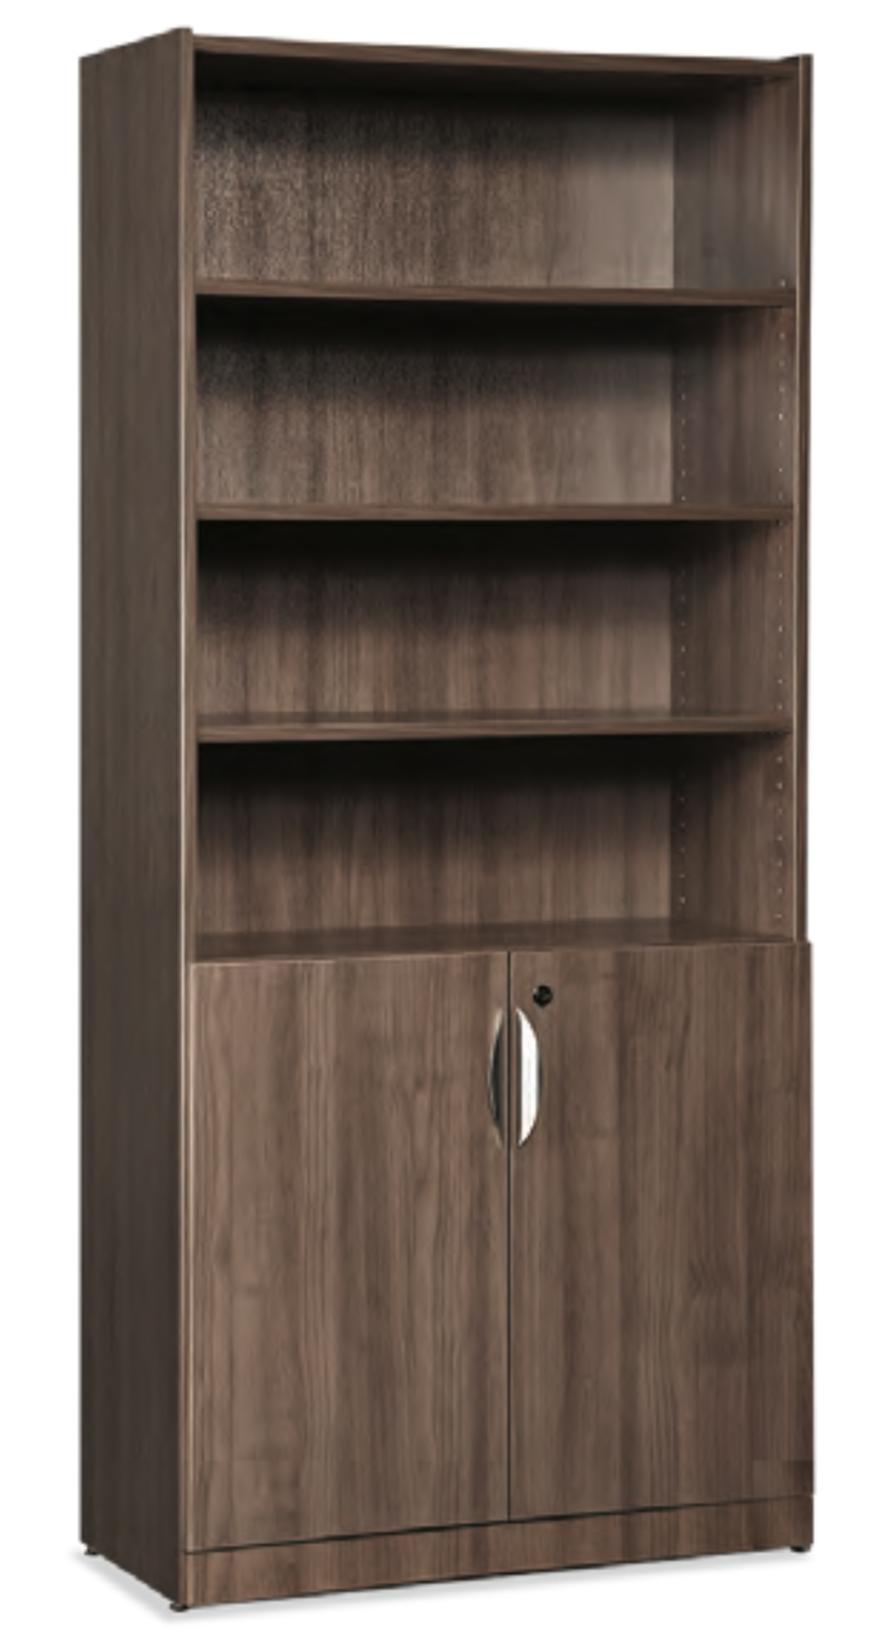 . Discount Office   File Cabinets   Storage   Berkley and Oak Park